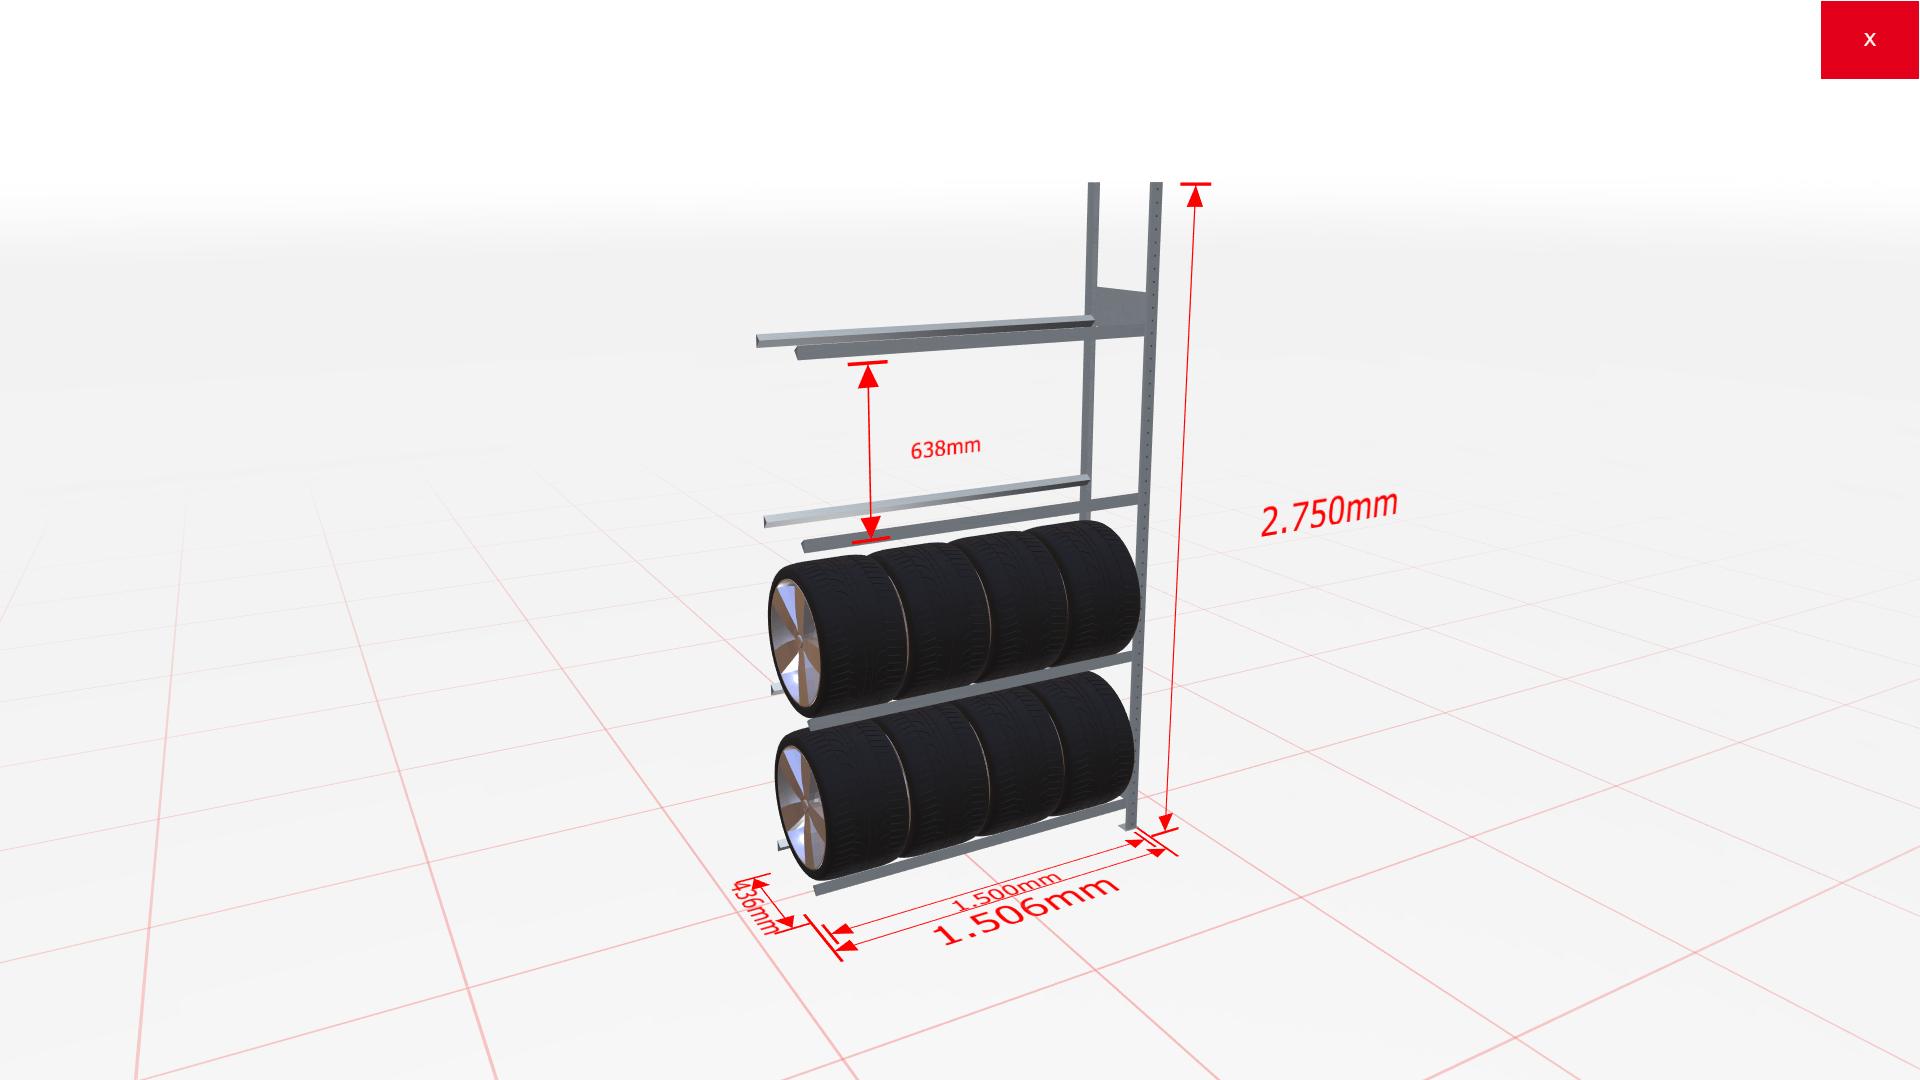 Räderregal Anbauregal SCHULTE Lagertechnik 2750x1500x400 mm – 4 Ebenen á 1500 mm, verzinkt